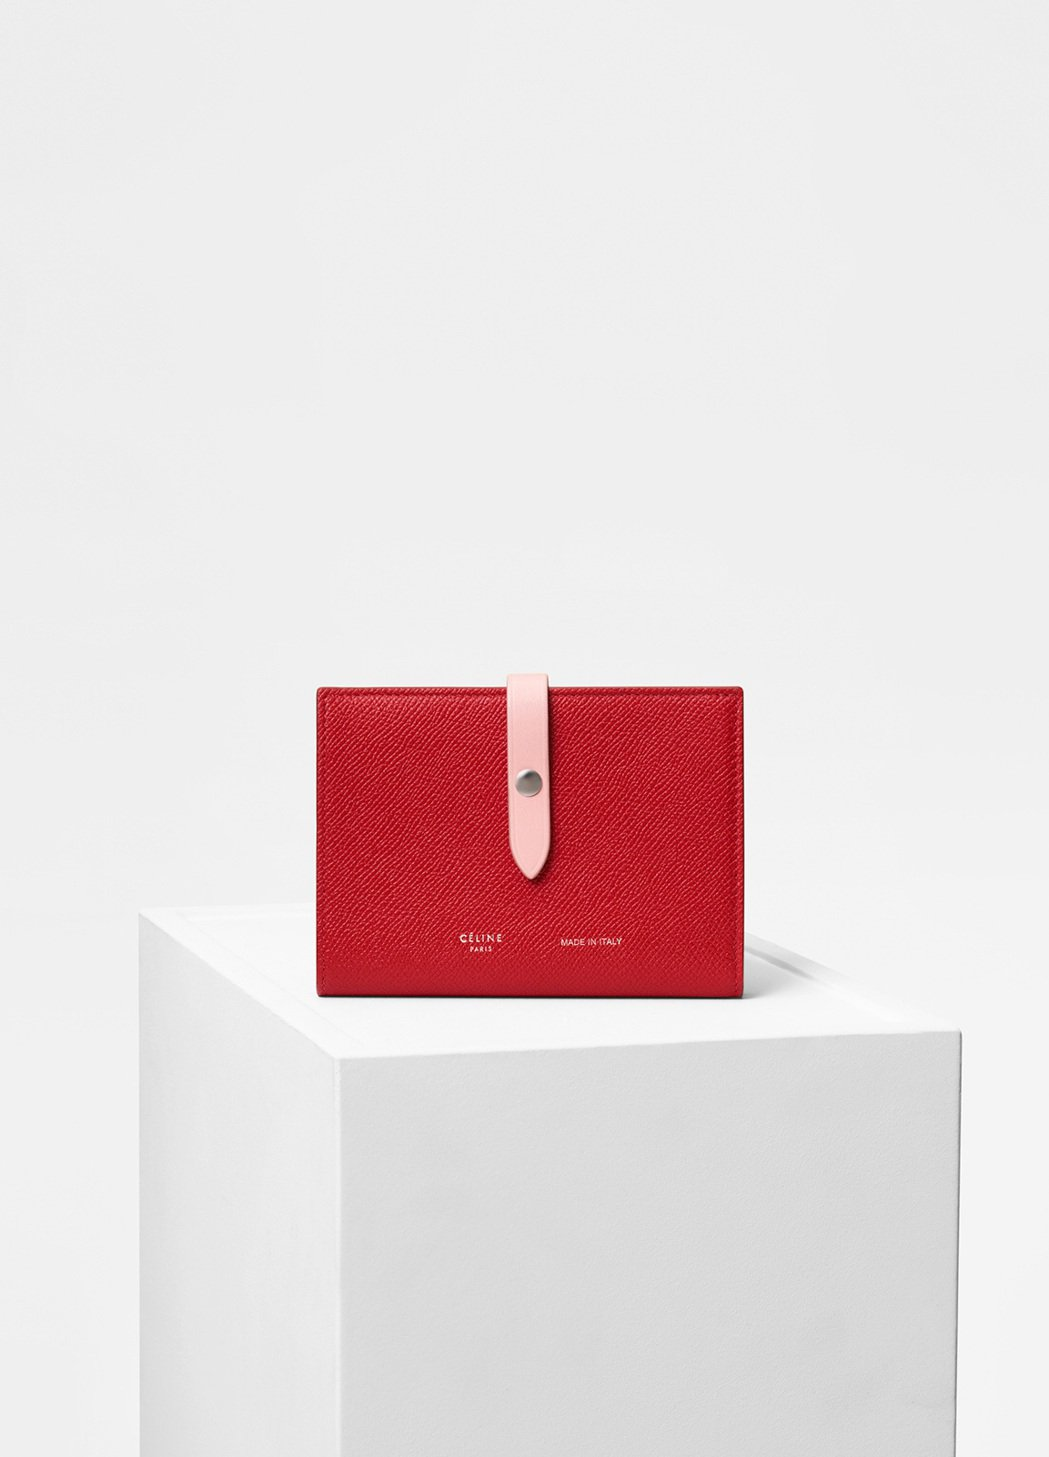 Strap亮紅色小牛皮中夾,售價22,500元。圖/CÉLINE提供